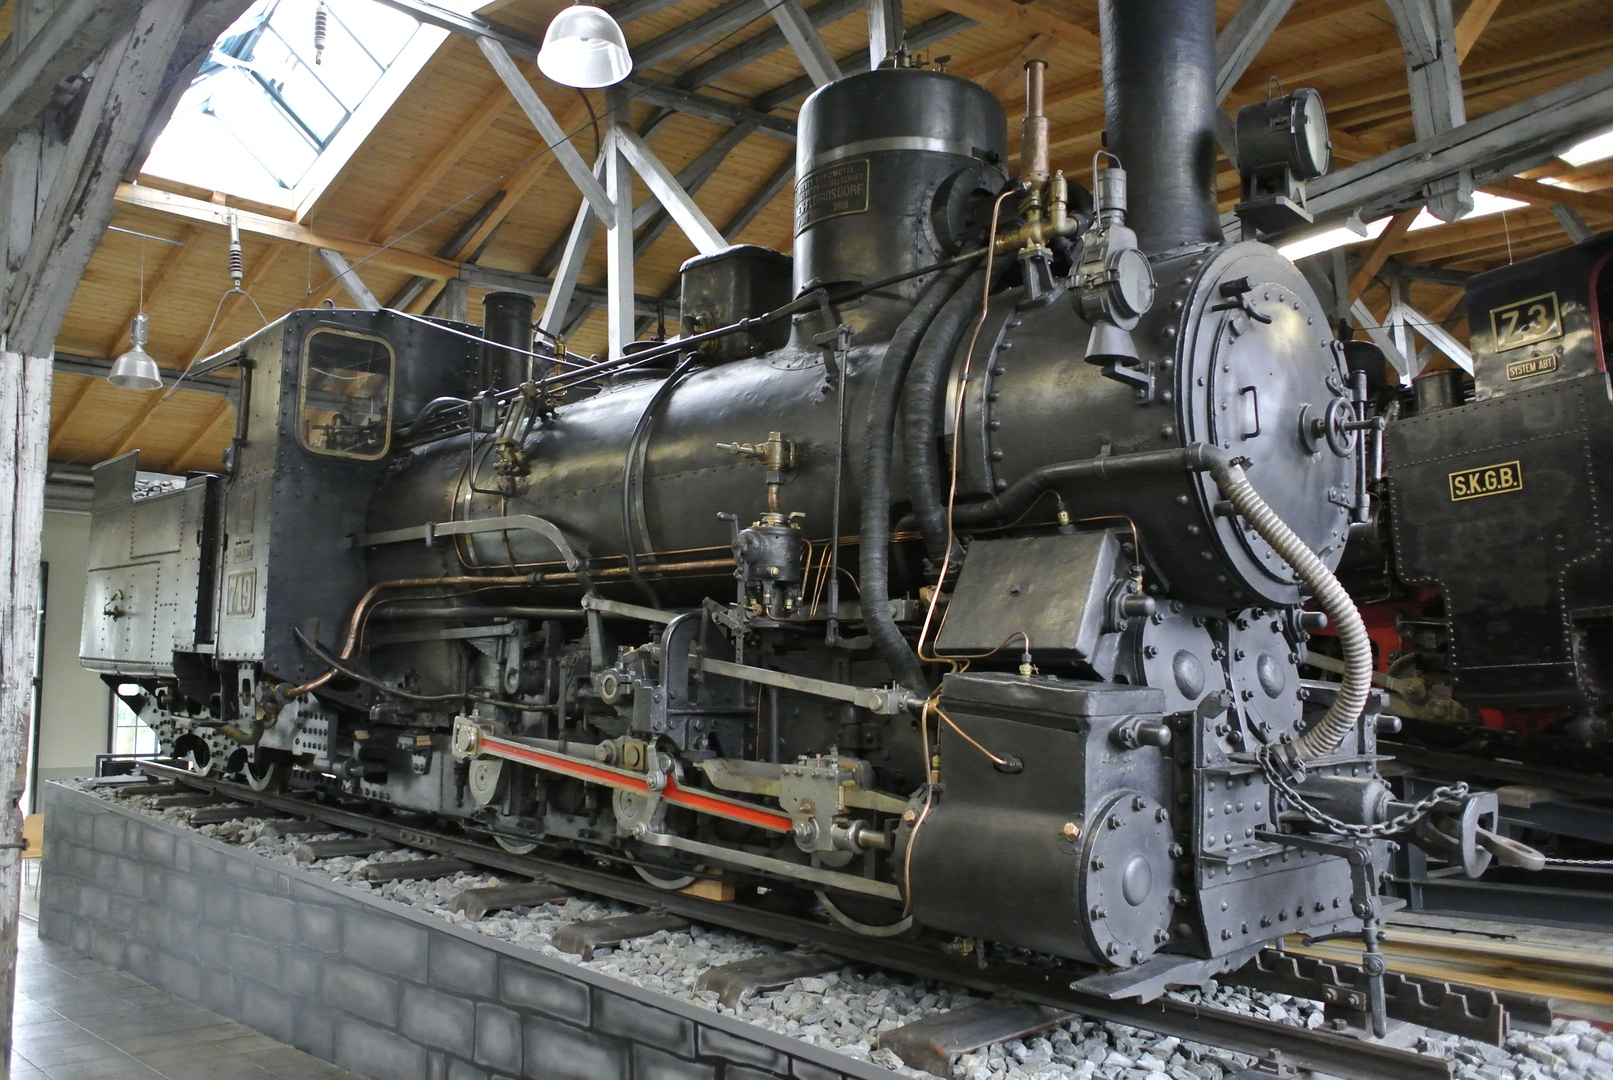 Zahnraddampflok III C 719 (Schmalspur)